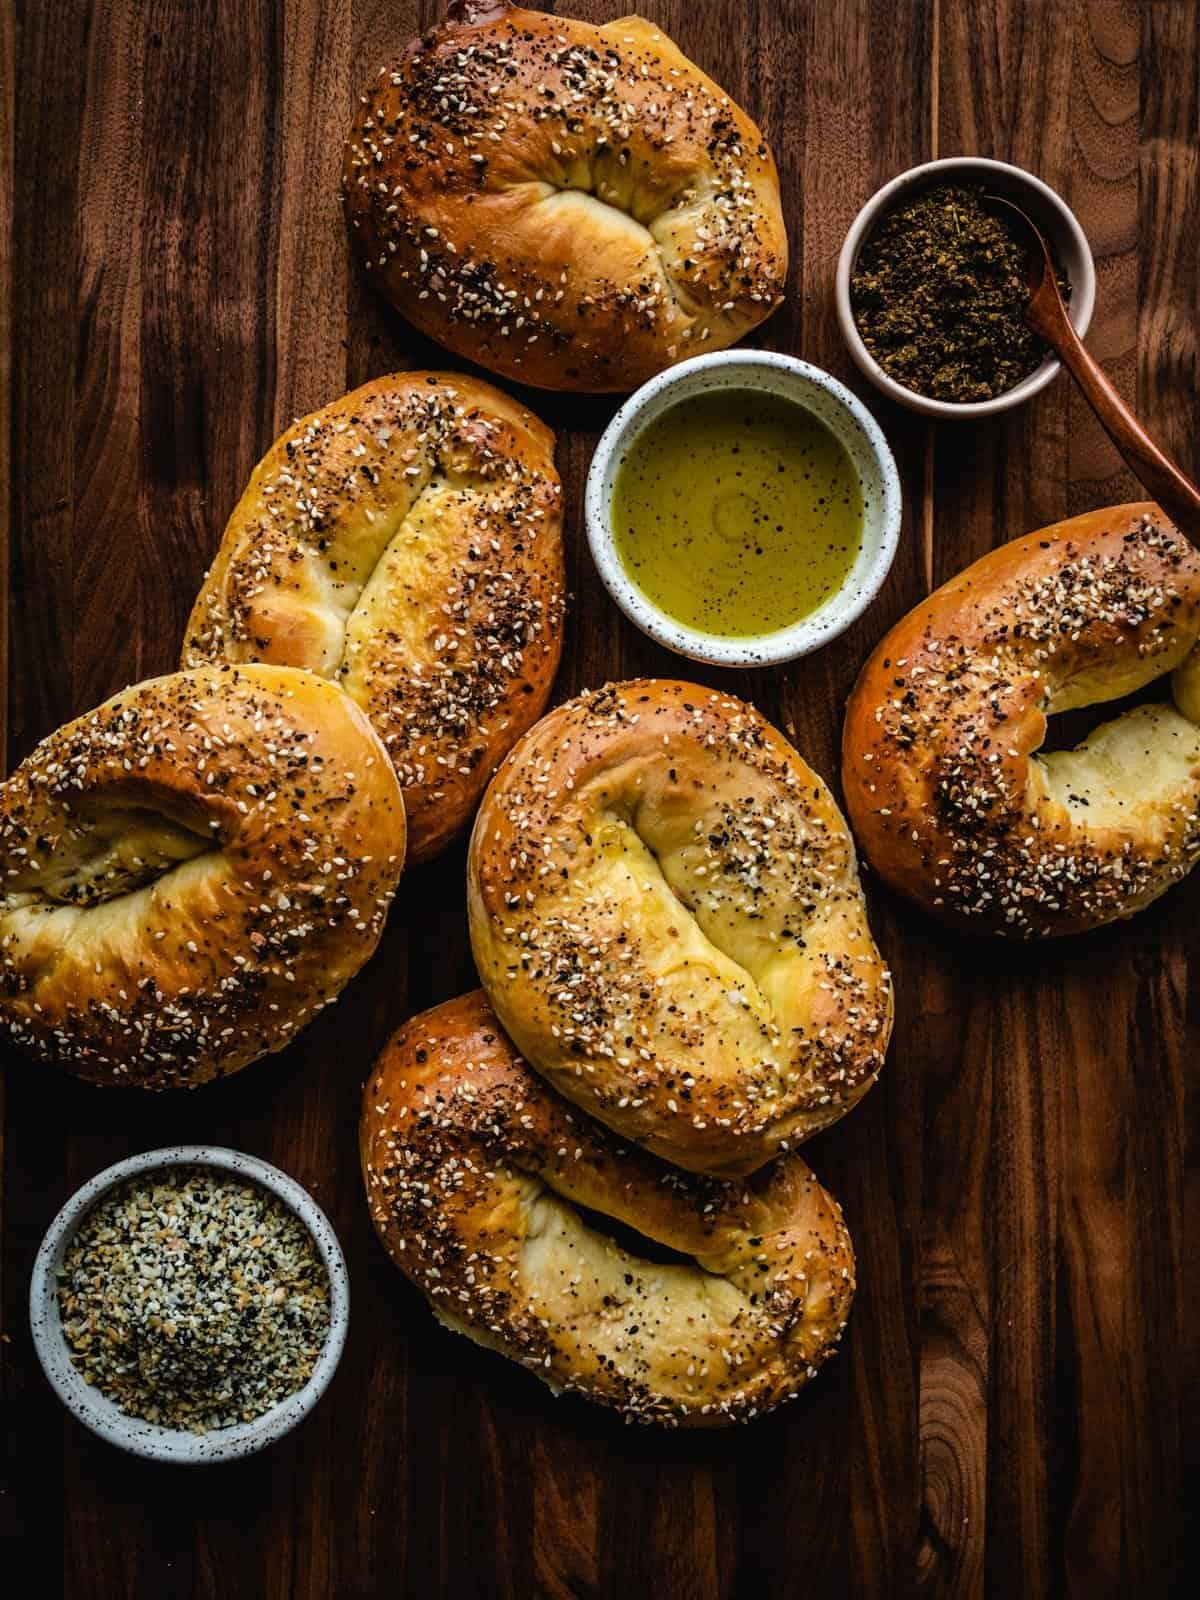 homemade Jerusalem Bagels with everything bagel seasoning